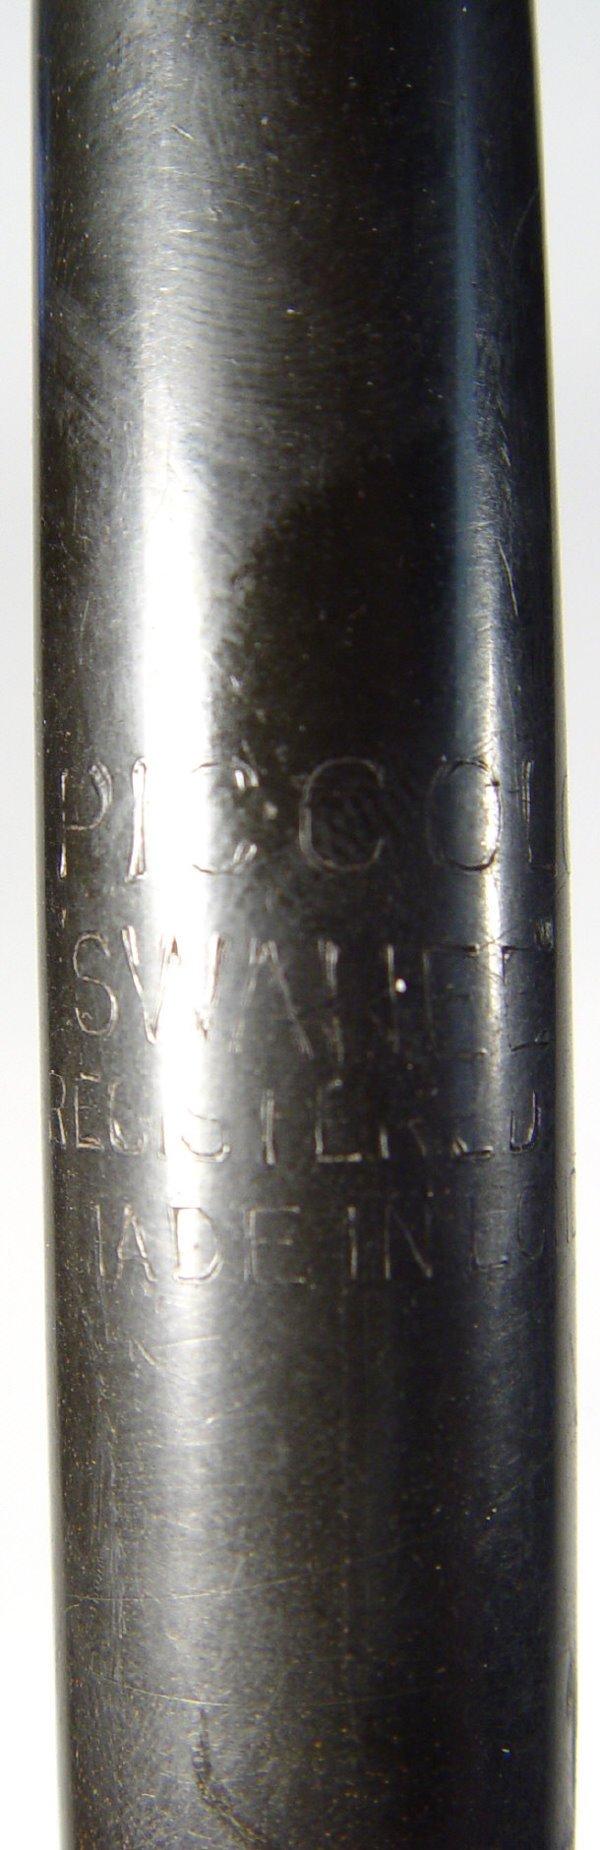 667: 19th Century wooden ocarina with original impresse - 3